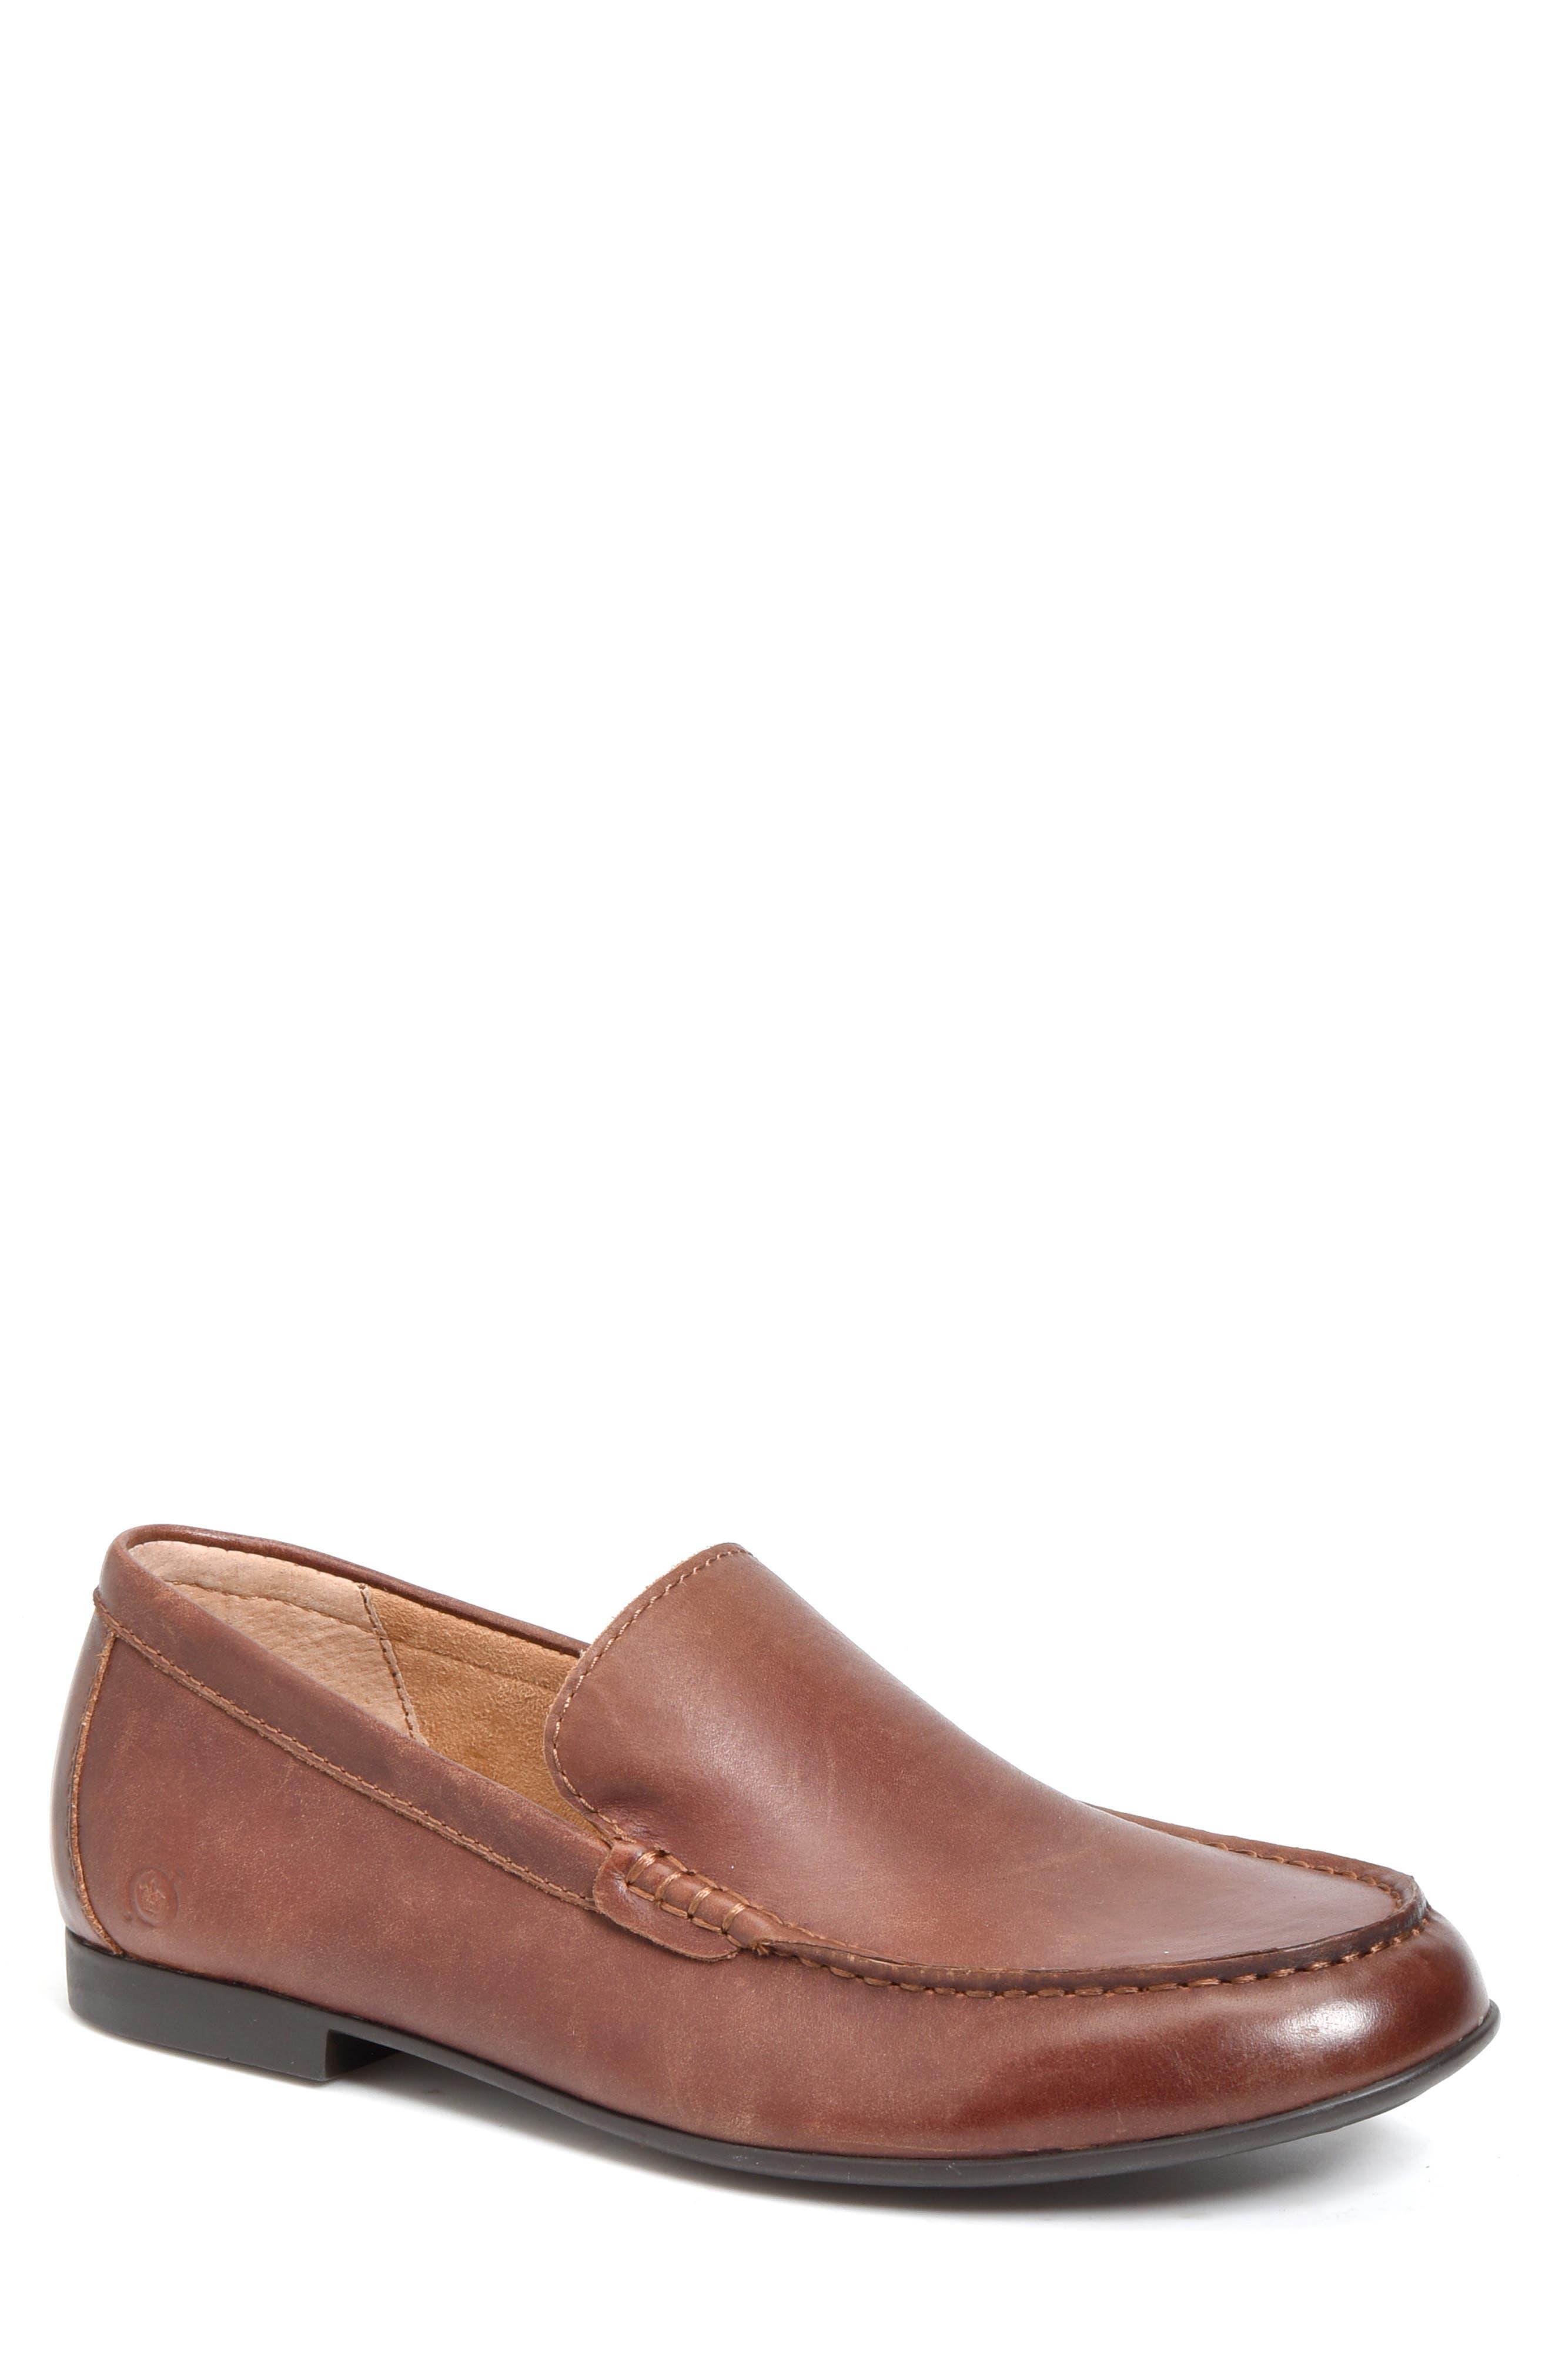 Image of Born Leather Slip-On Loafer